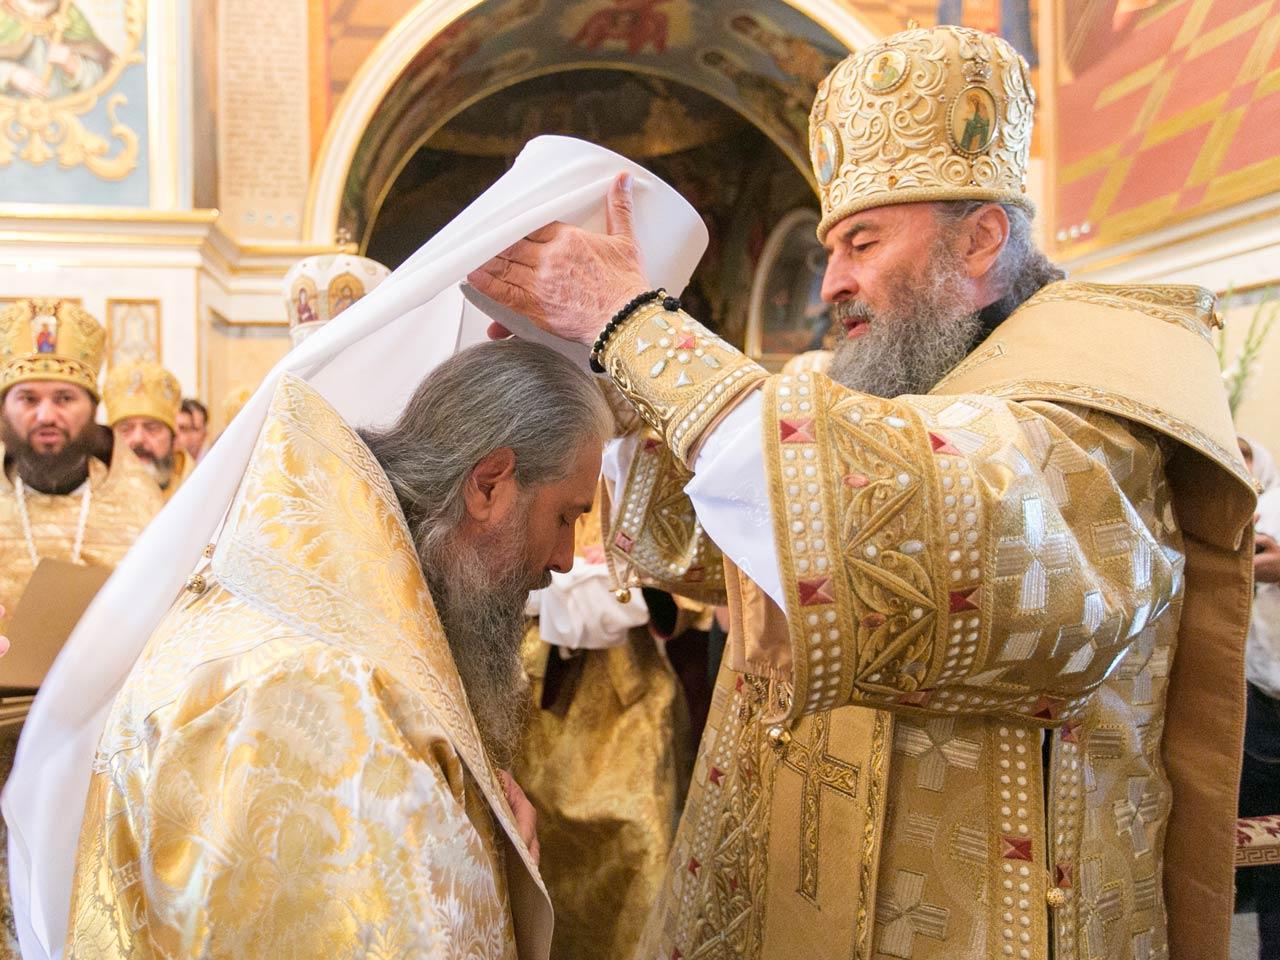 Возведение наместника Святогорской Лавры архиепископа Арсения в сан митрополита. 17 августа 2015г.